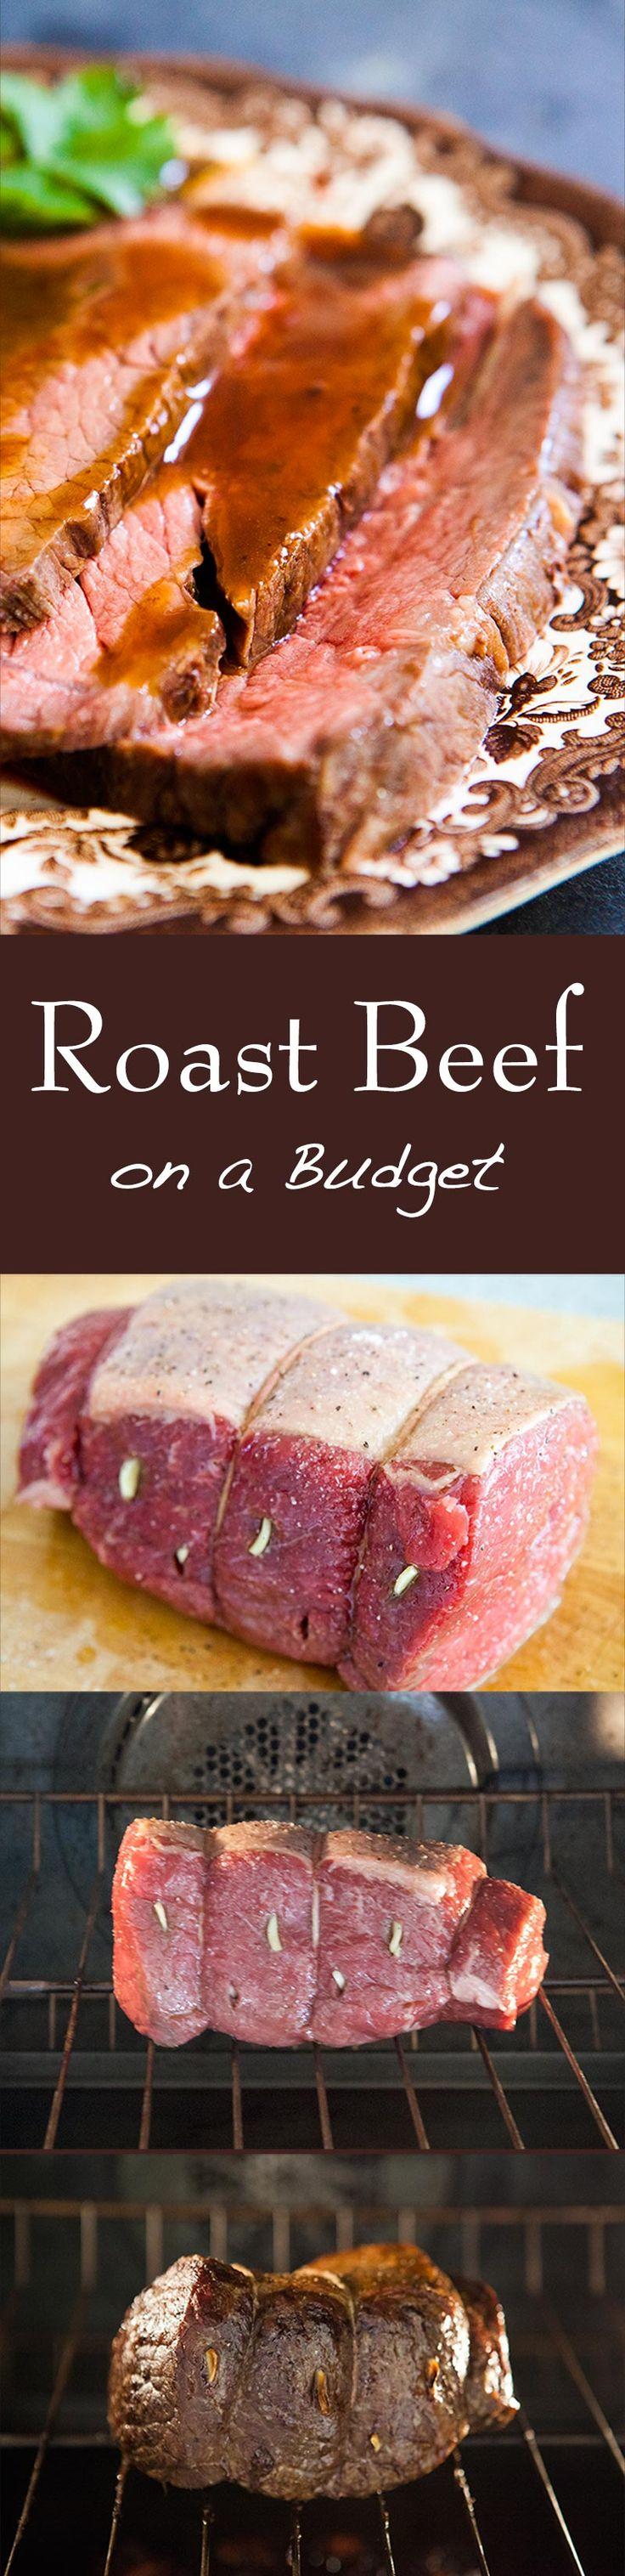 Classic roast beef recipe using rump roast, round roast, or sirloin ...